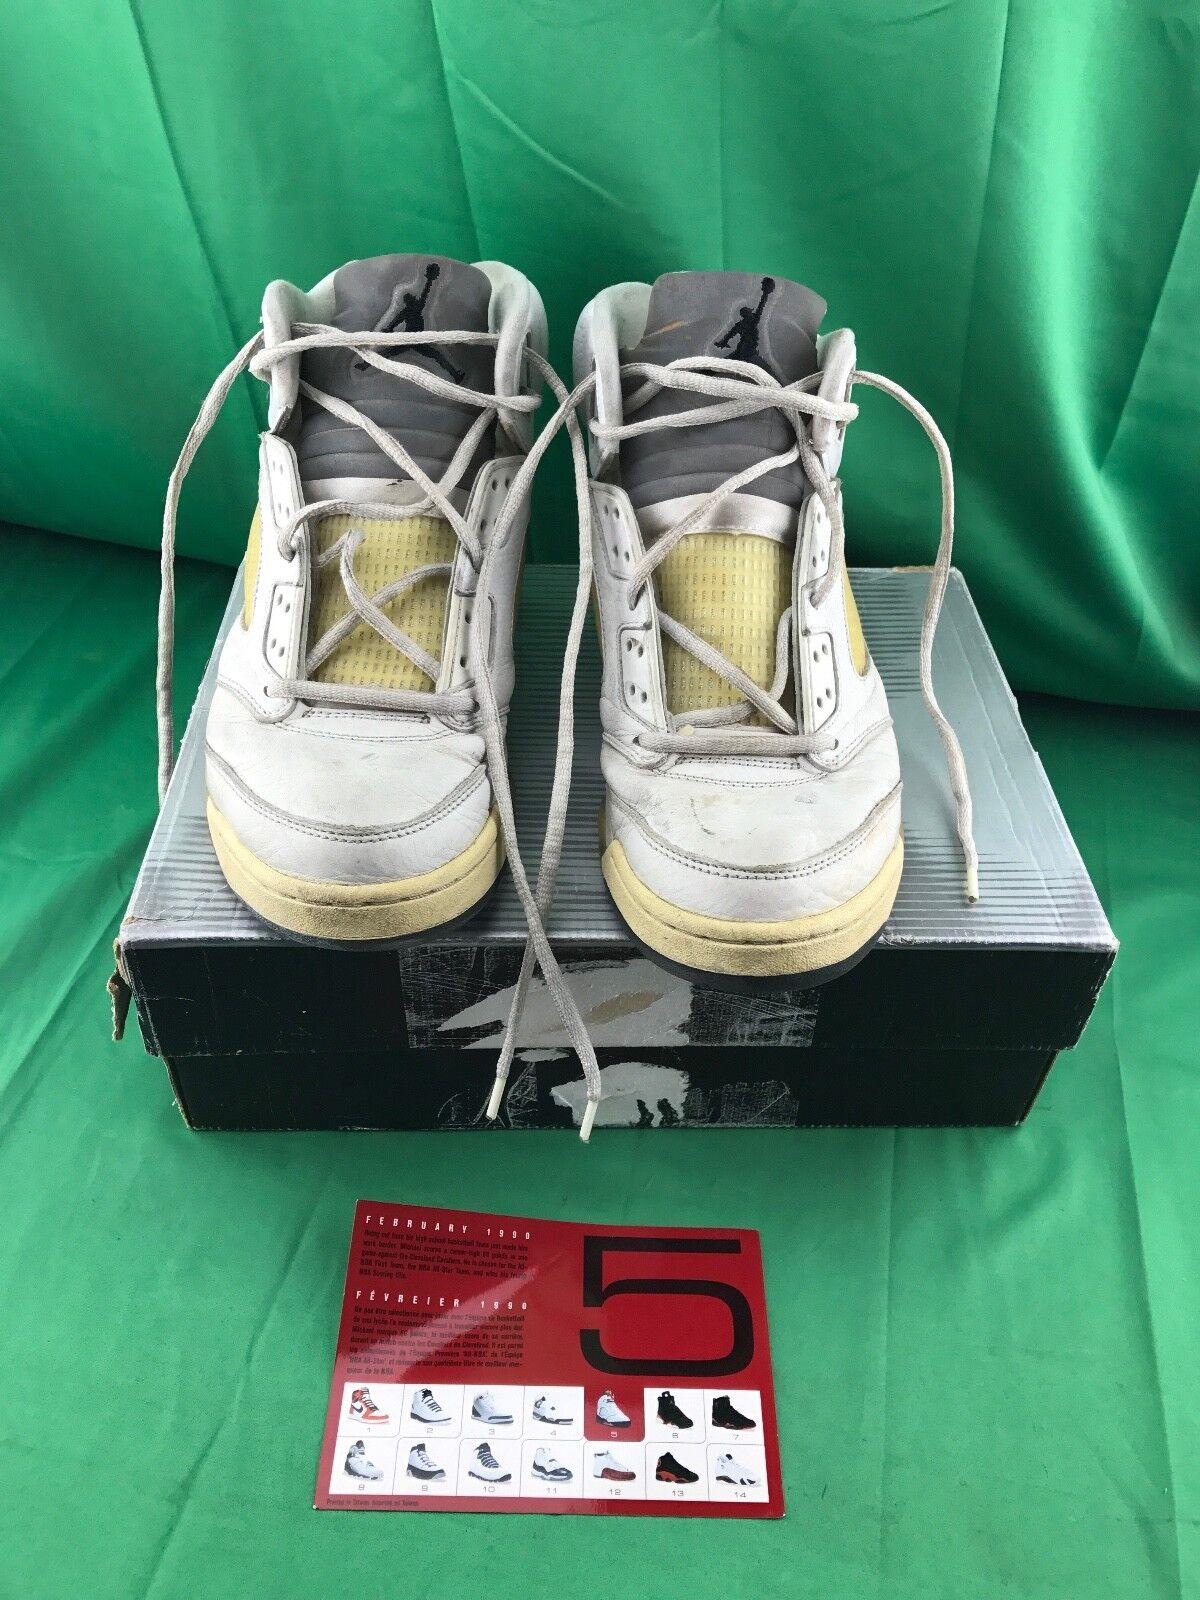 2018 Nike Air Jordan 5 retro V og SZ 136045-101 10,5 Blanco Metallic Plata 136045-101 SZ DS b7eb2f